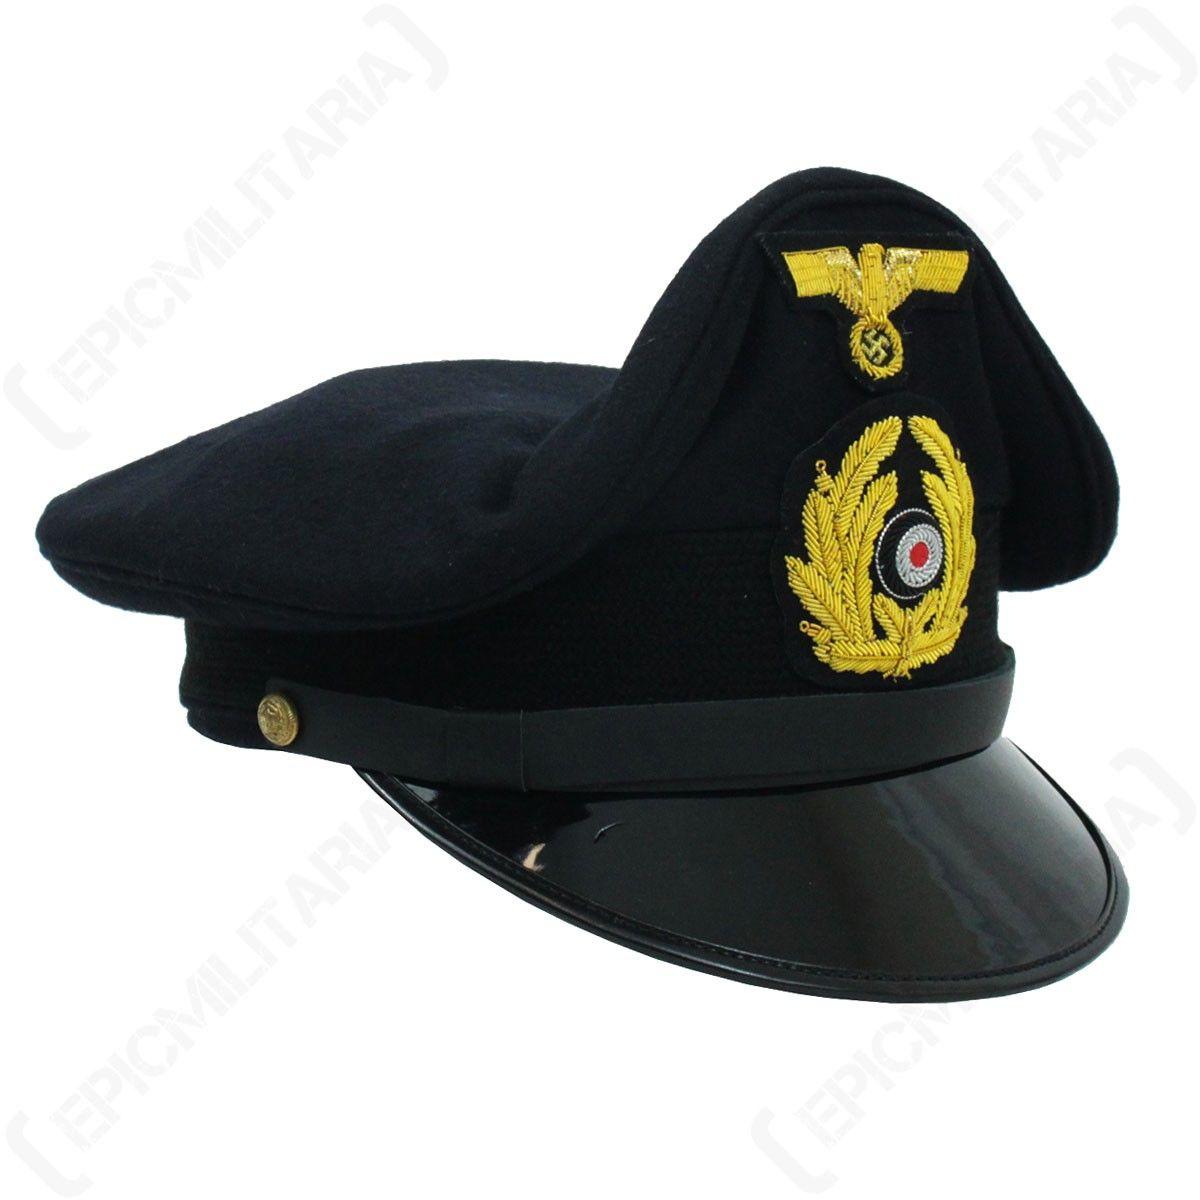 Kriegsmarine NCO Visor Cap  6d2d5ce59f5